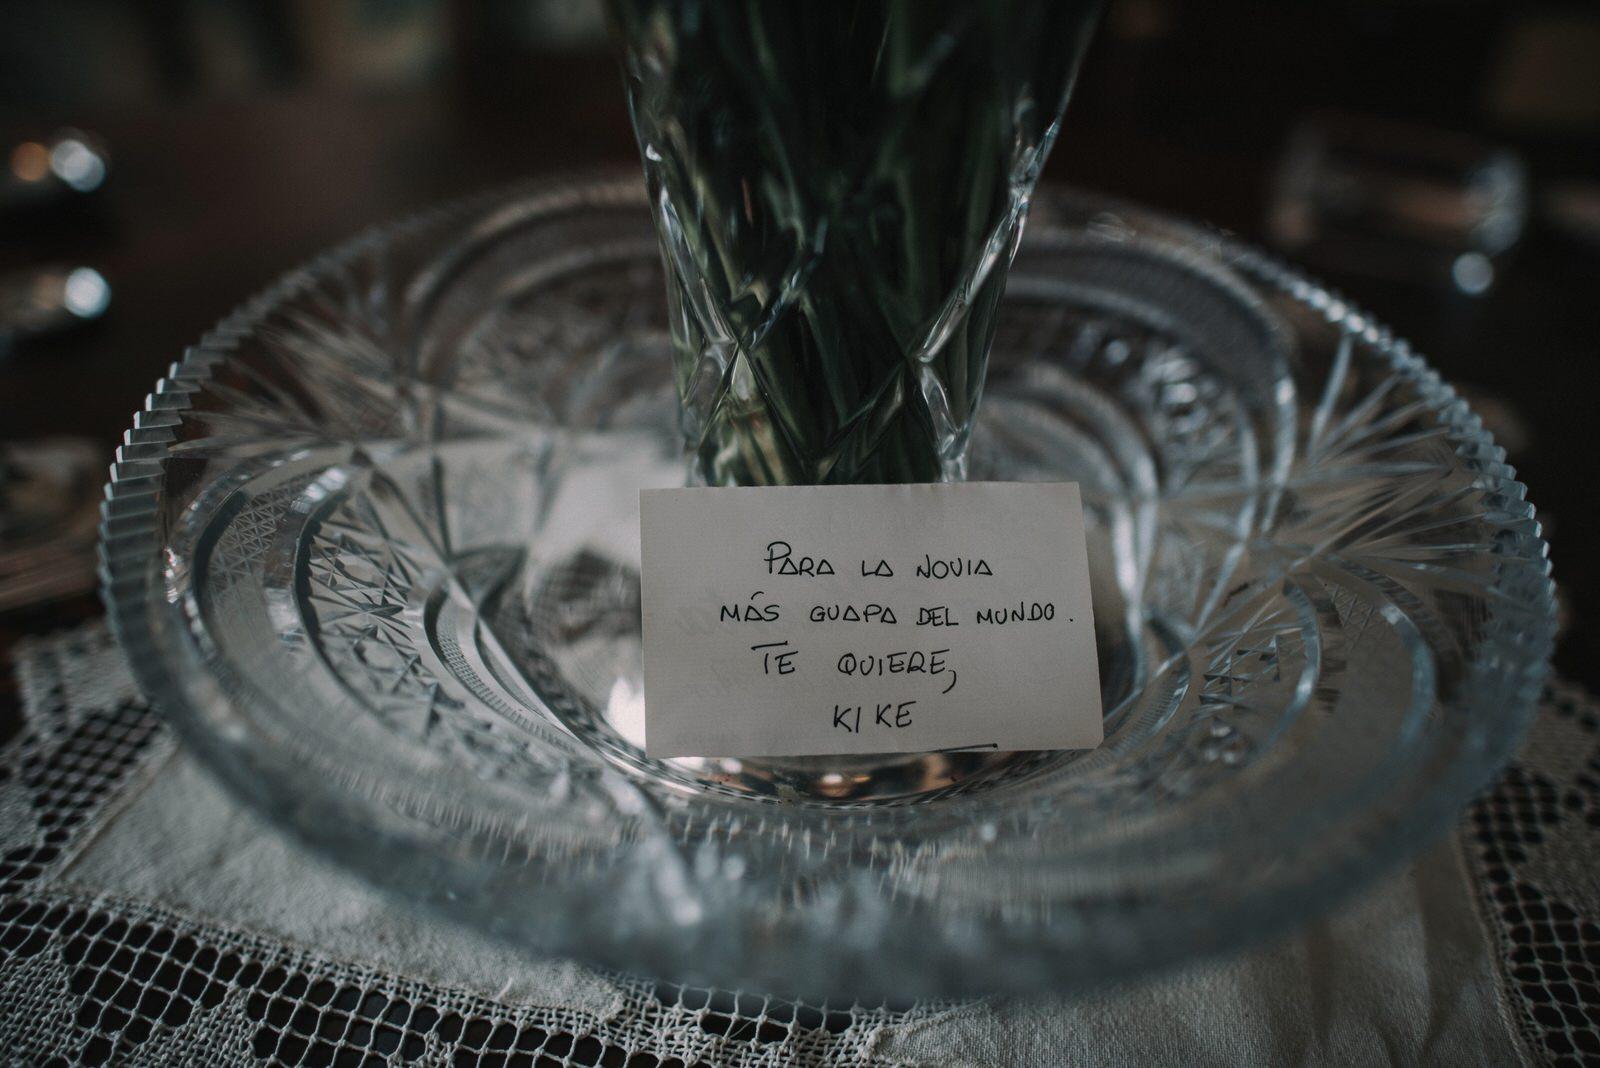 fotografo de bodas sevilla - fotografo boda - fotografía sevilla - Andrés AmarilloAAA_2709- fine.JPG